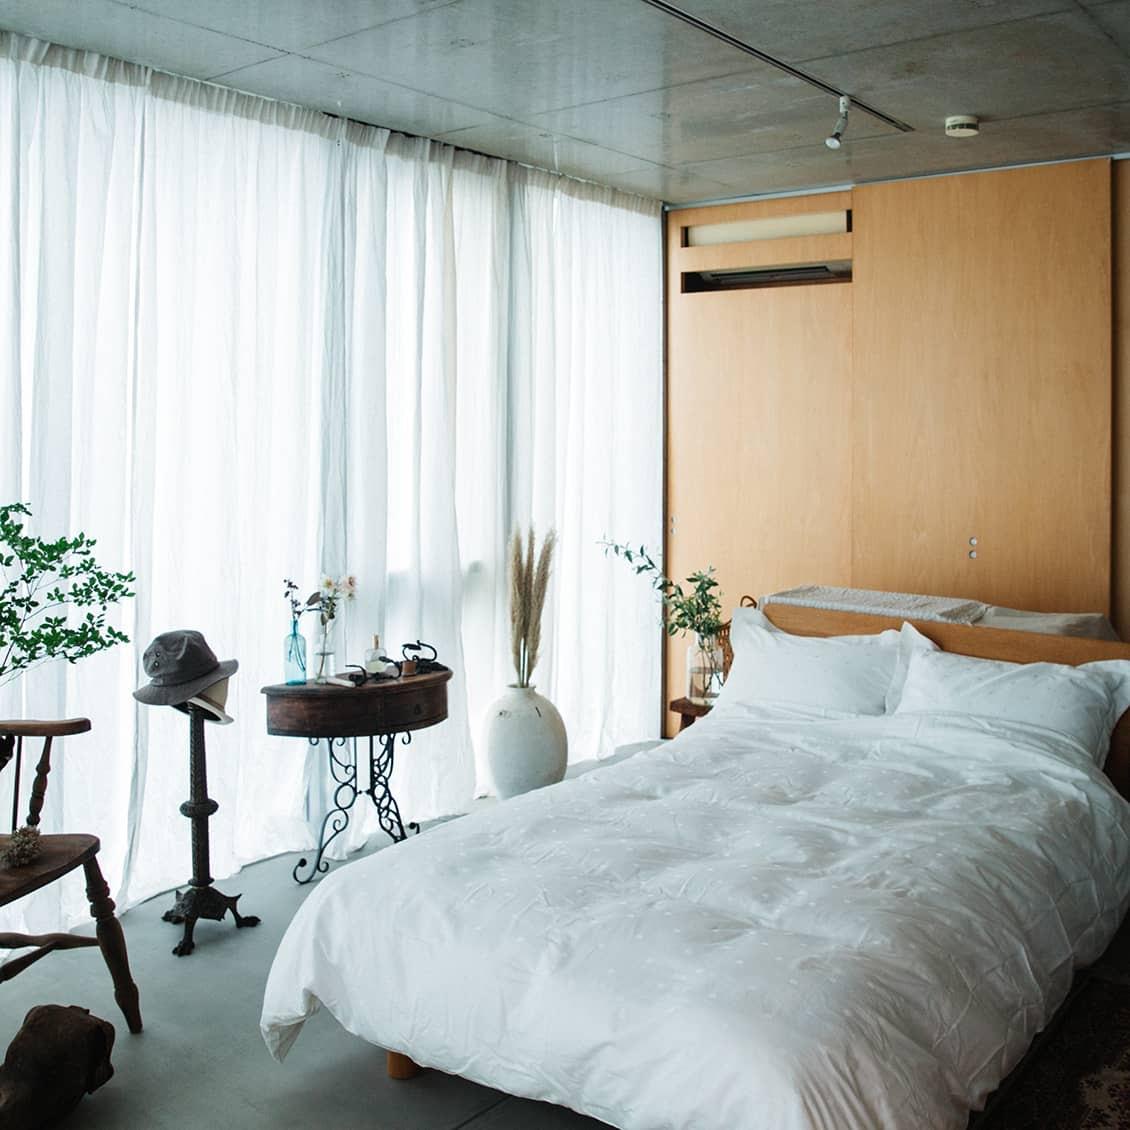 【BRAND NOTE】使って実感、北欧流の豊かな眠り。包まれるような「やさしい寝具」たち。